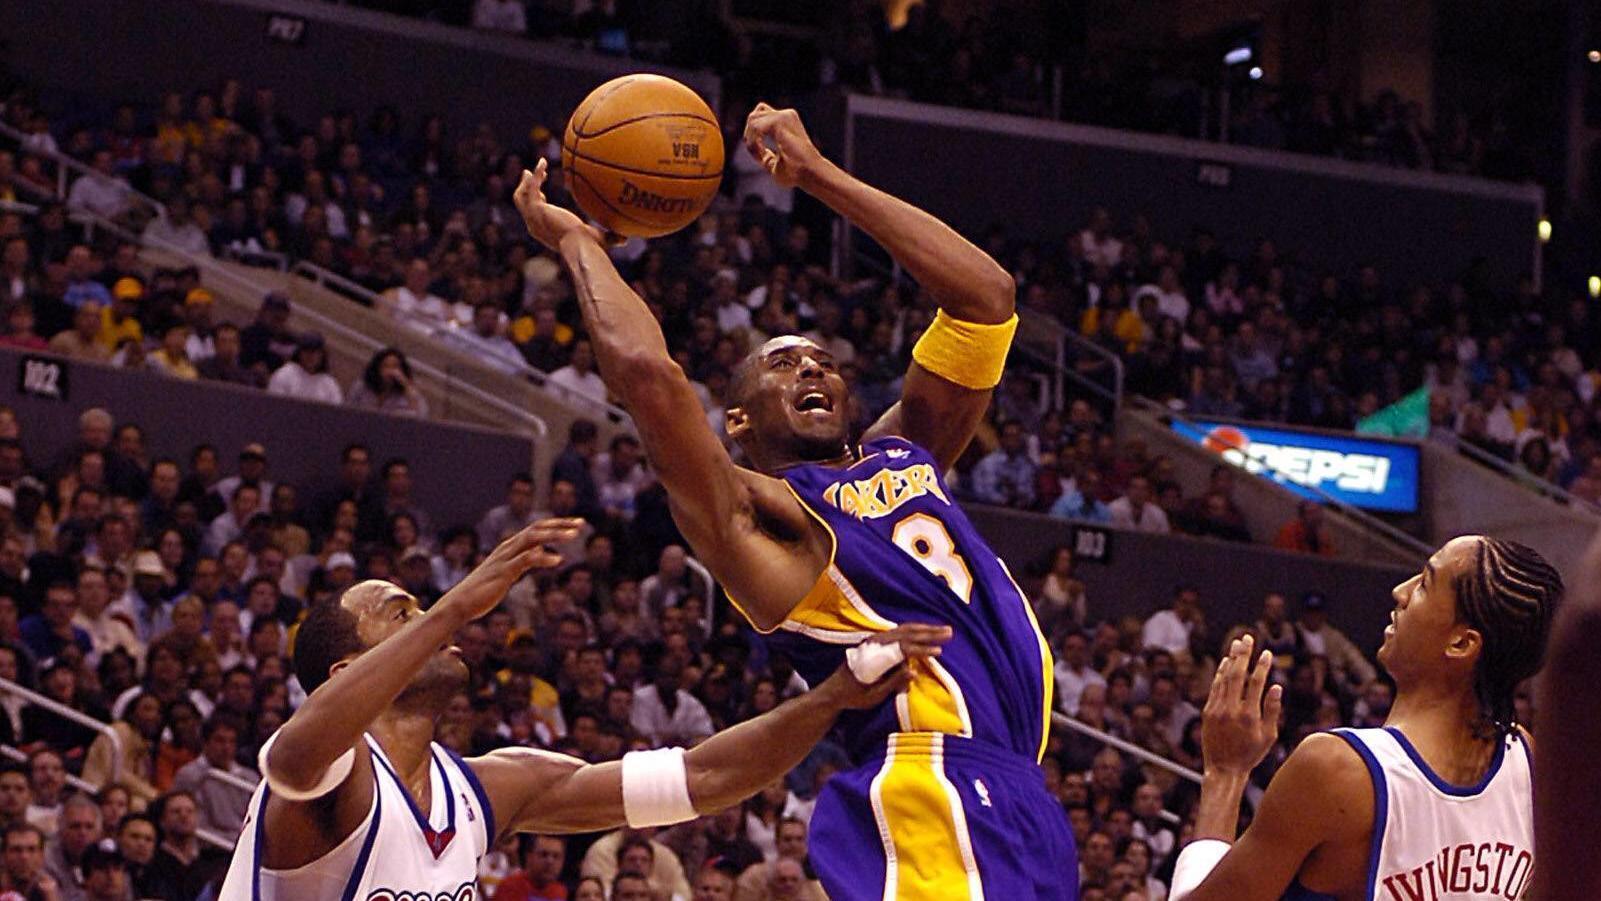 Kobe Bryant (Los Angeles Lakers, Mitte) gegen Shaun Livingston (re.) und Daniel Ewing (beide Los Angeles Clippers) - PU